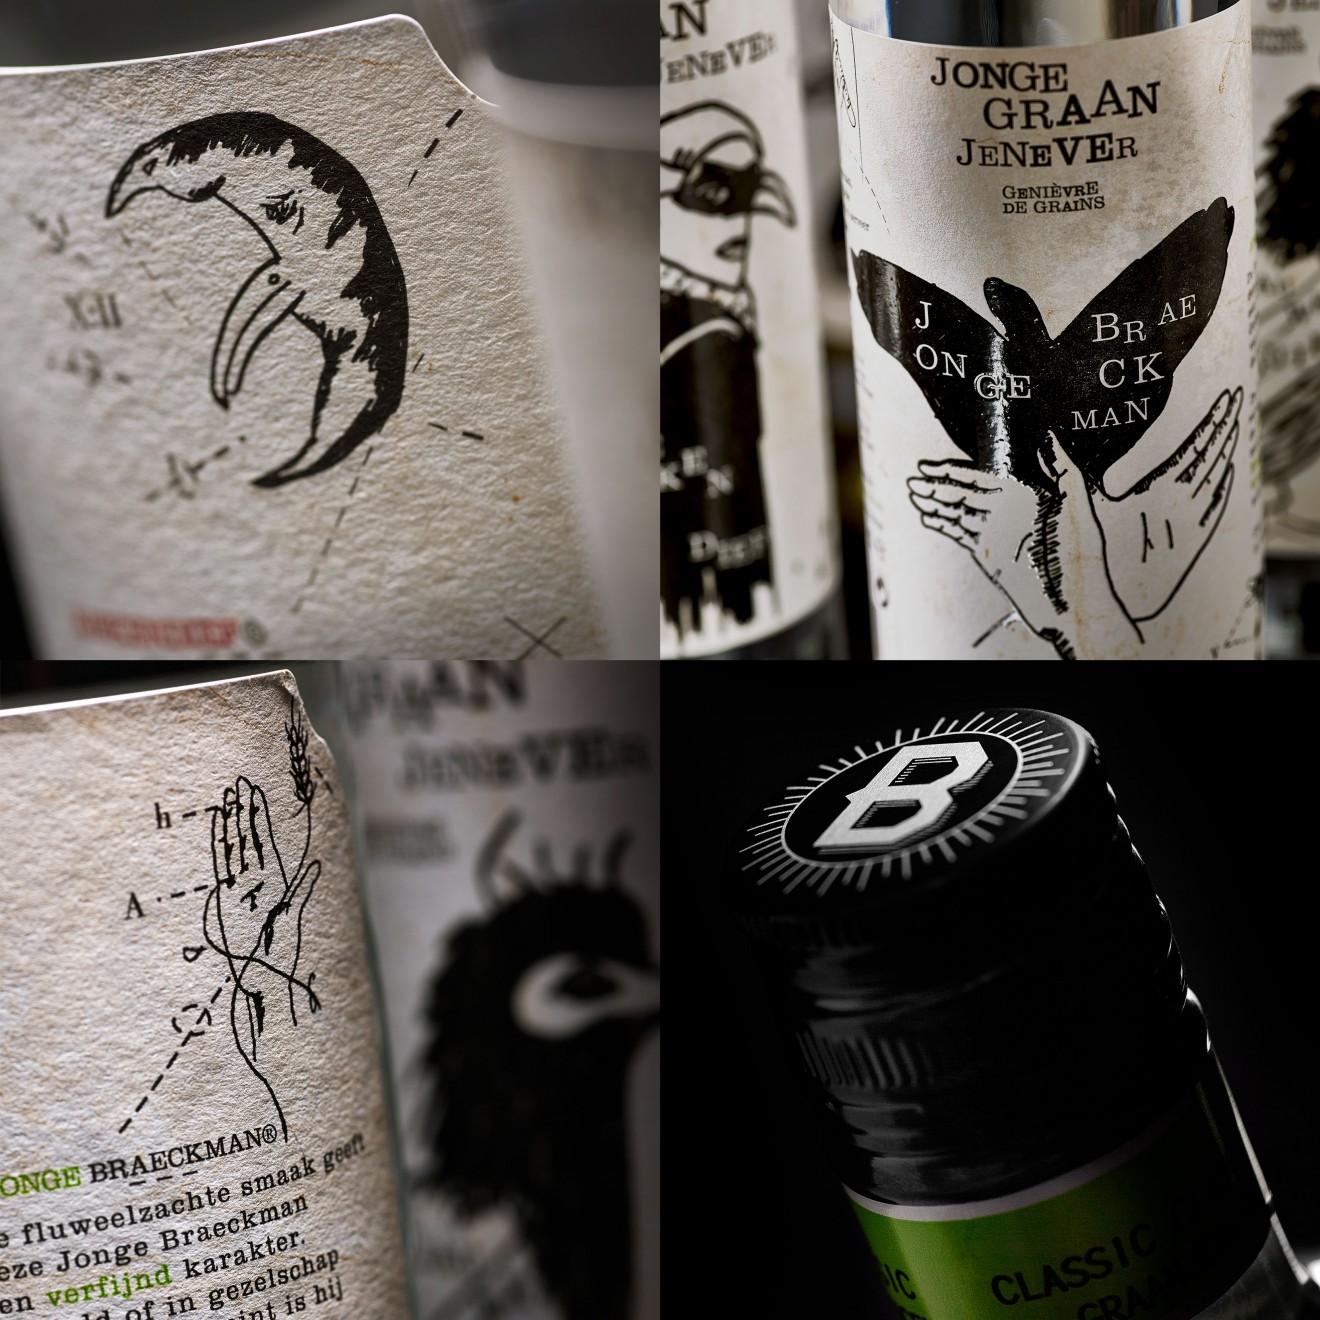 Quatre Mains package design - detail, bottle design, packaging, label